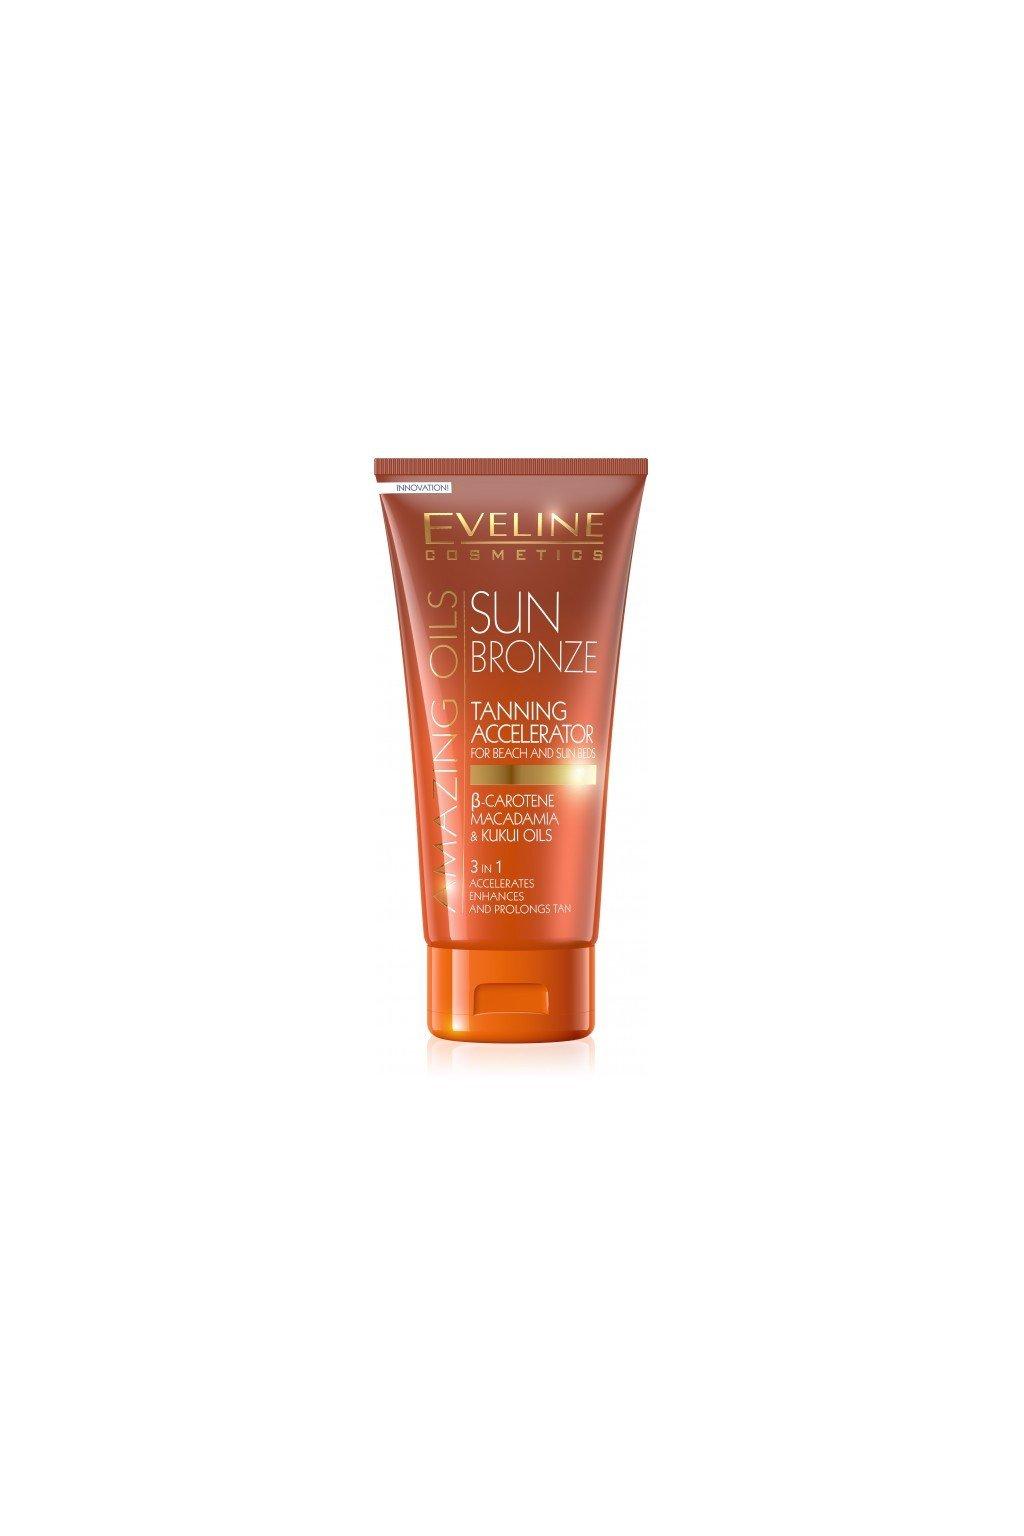 Eveline cosmetics sun care Urychlovac opaleni 150 ml